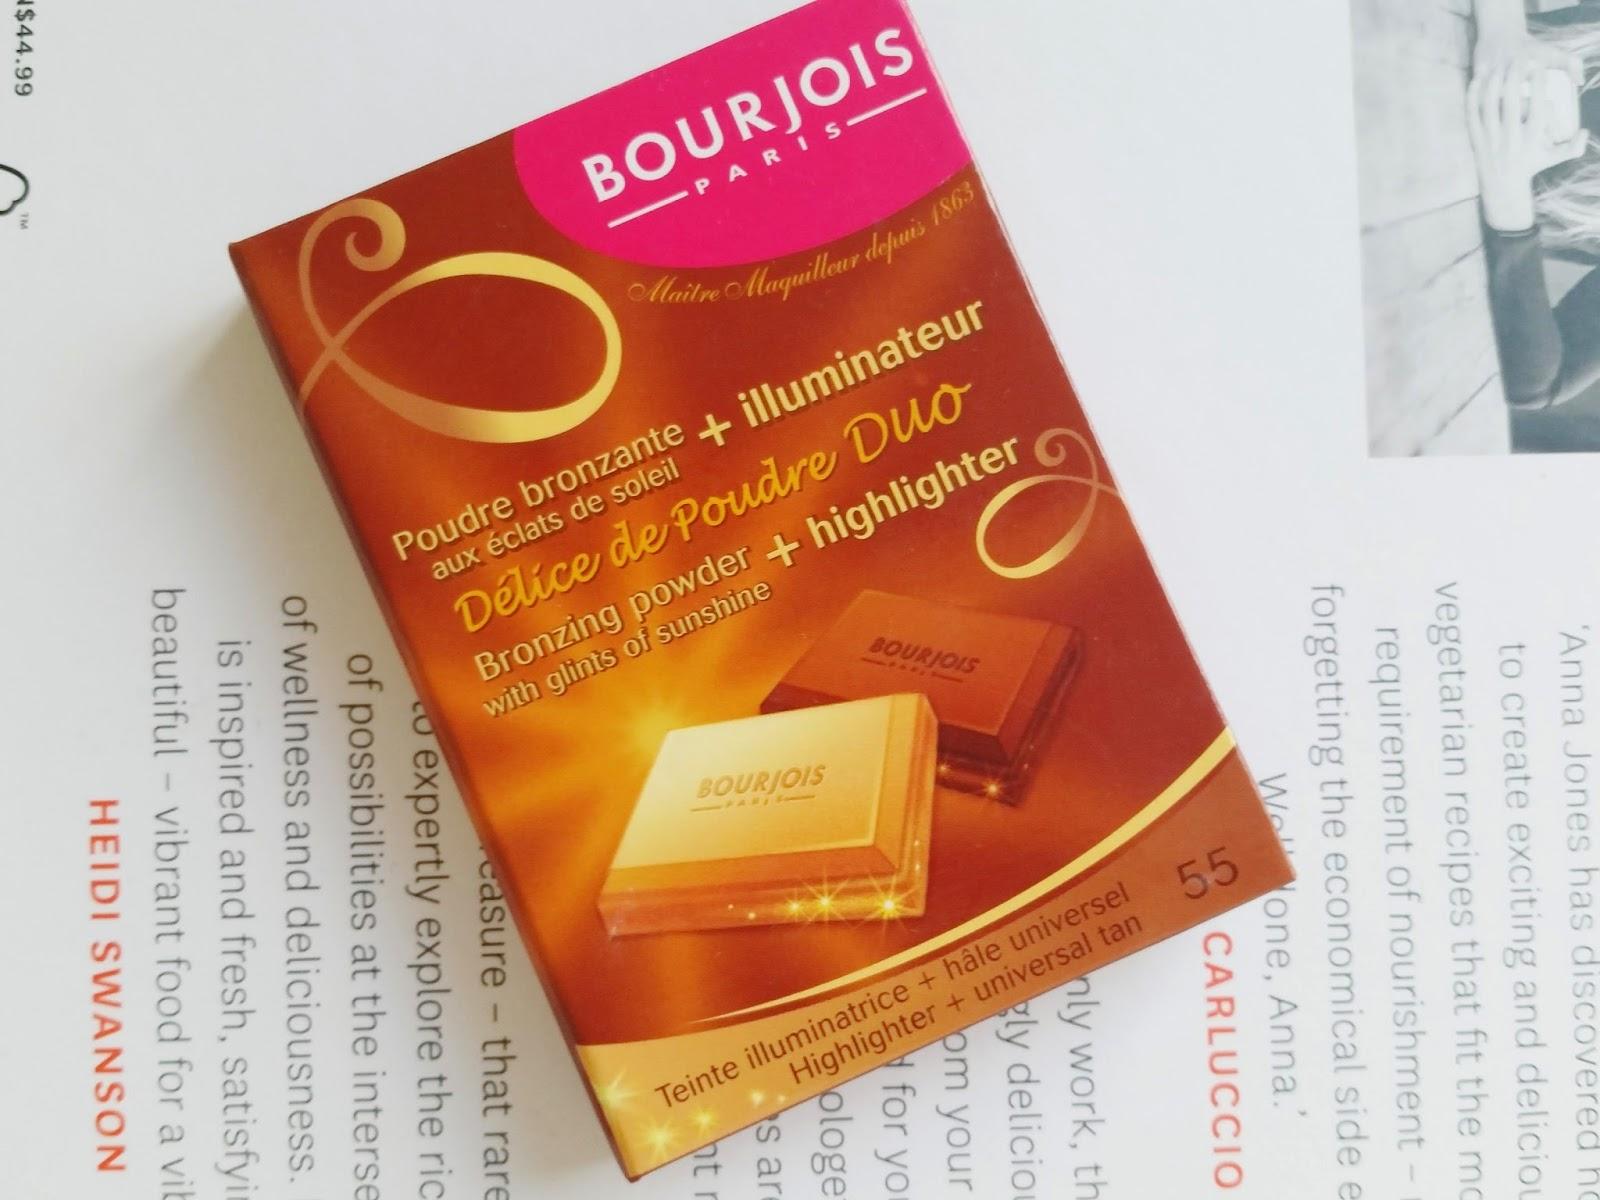 Bourjois Delice de Poudre Powder & Highlighter